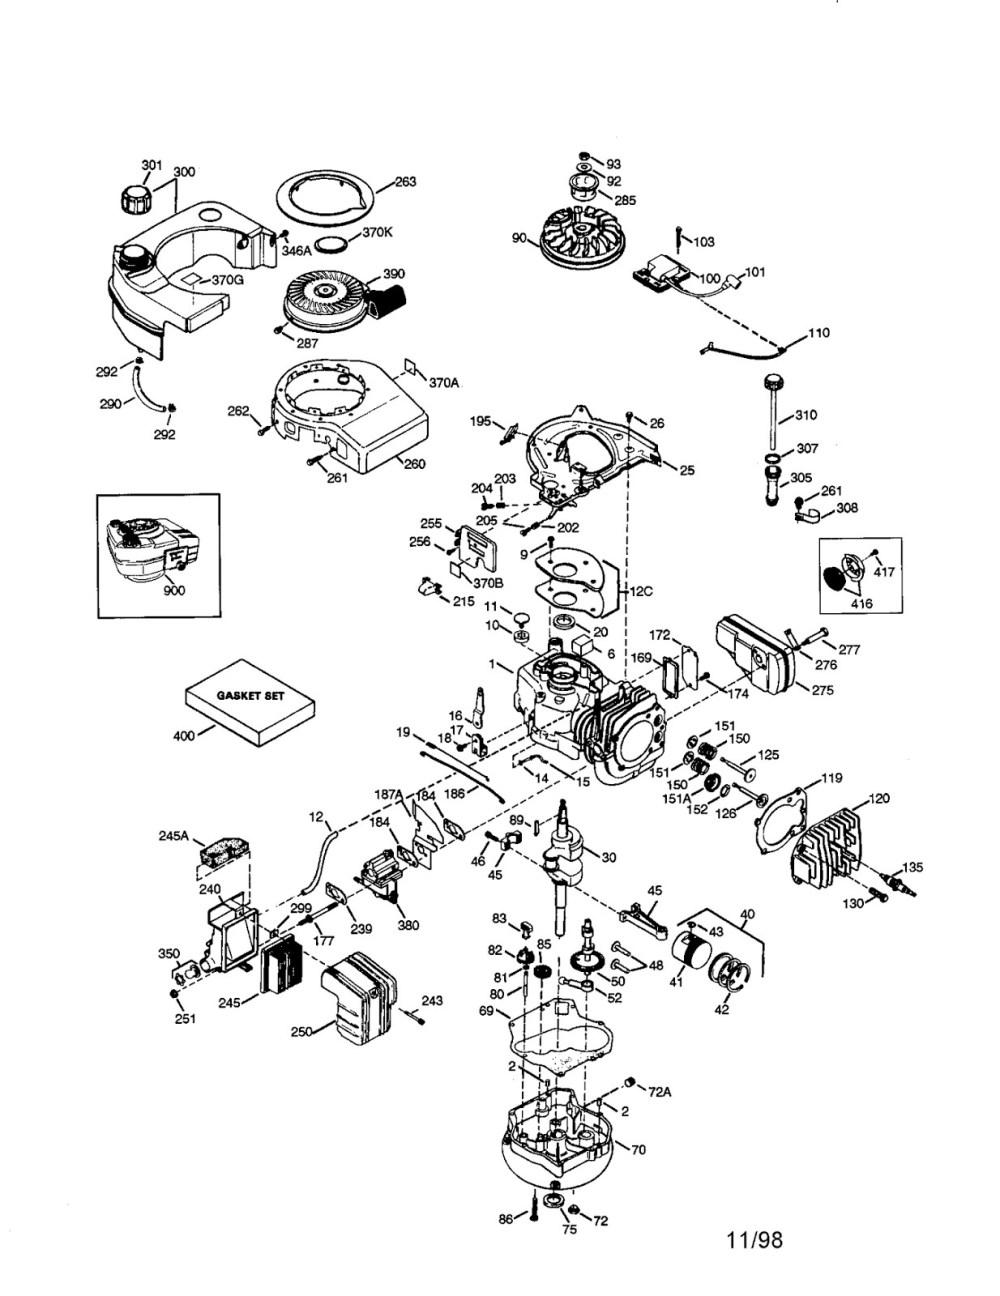 medium resolution of honda gx390 parts diagram free service repair manual tecumseh engine parts diagram of honda gx390 parts